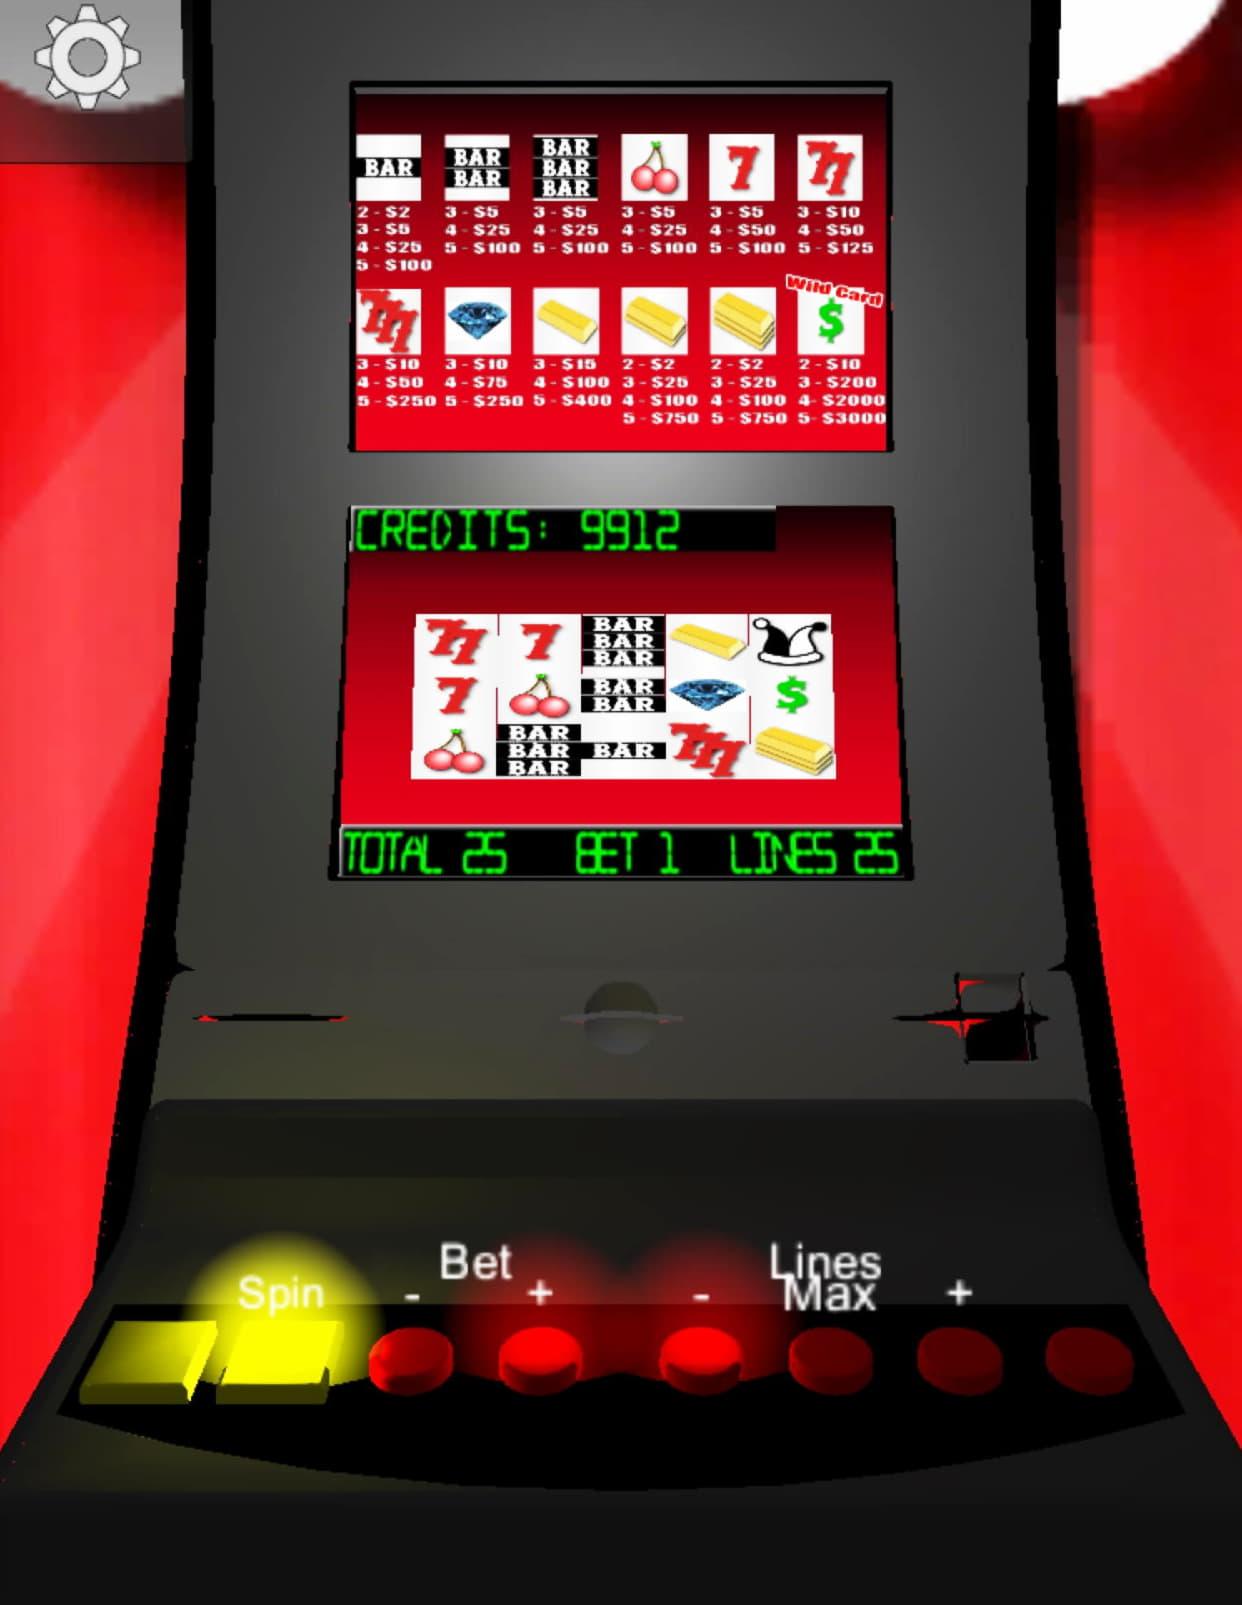 € 325 Uimh bónas taisce ag Spin Palace Casino